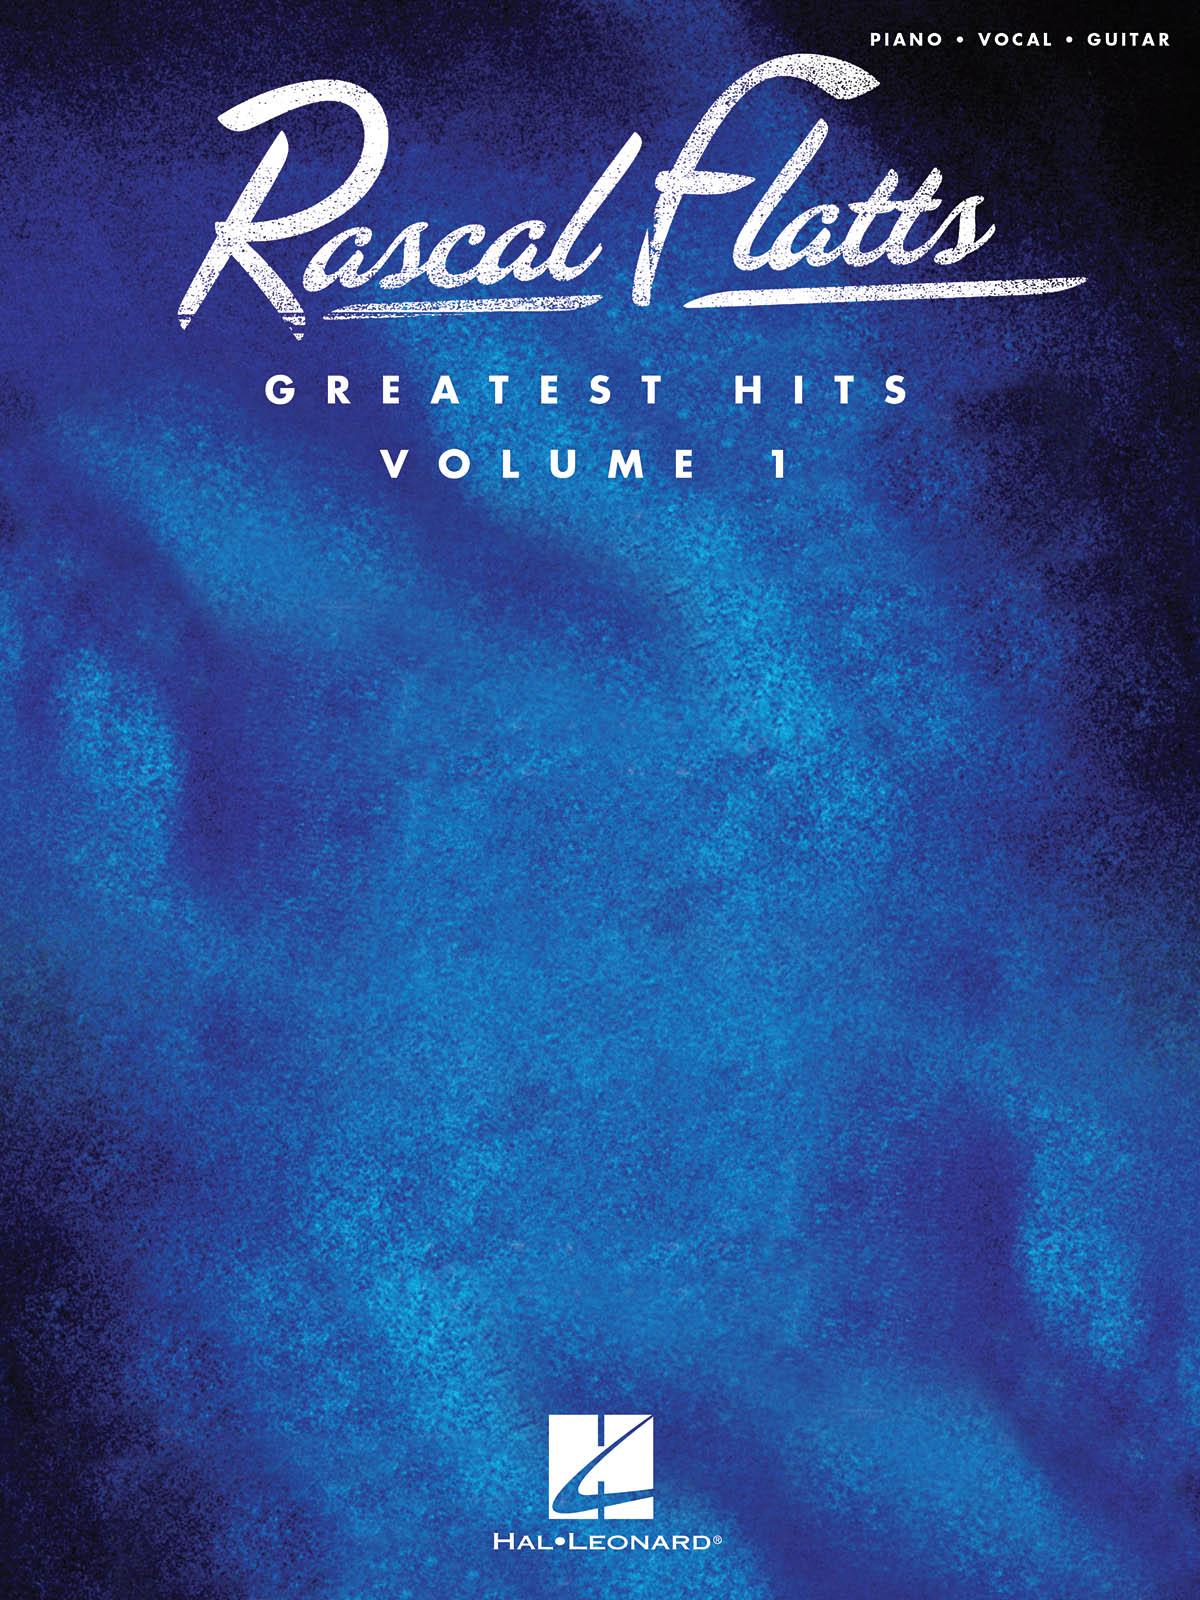 Rascal Flatts: Rascal Flatts - Greatest Hits  Volume 1: Piano  Vocal and Guitar: